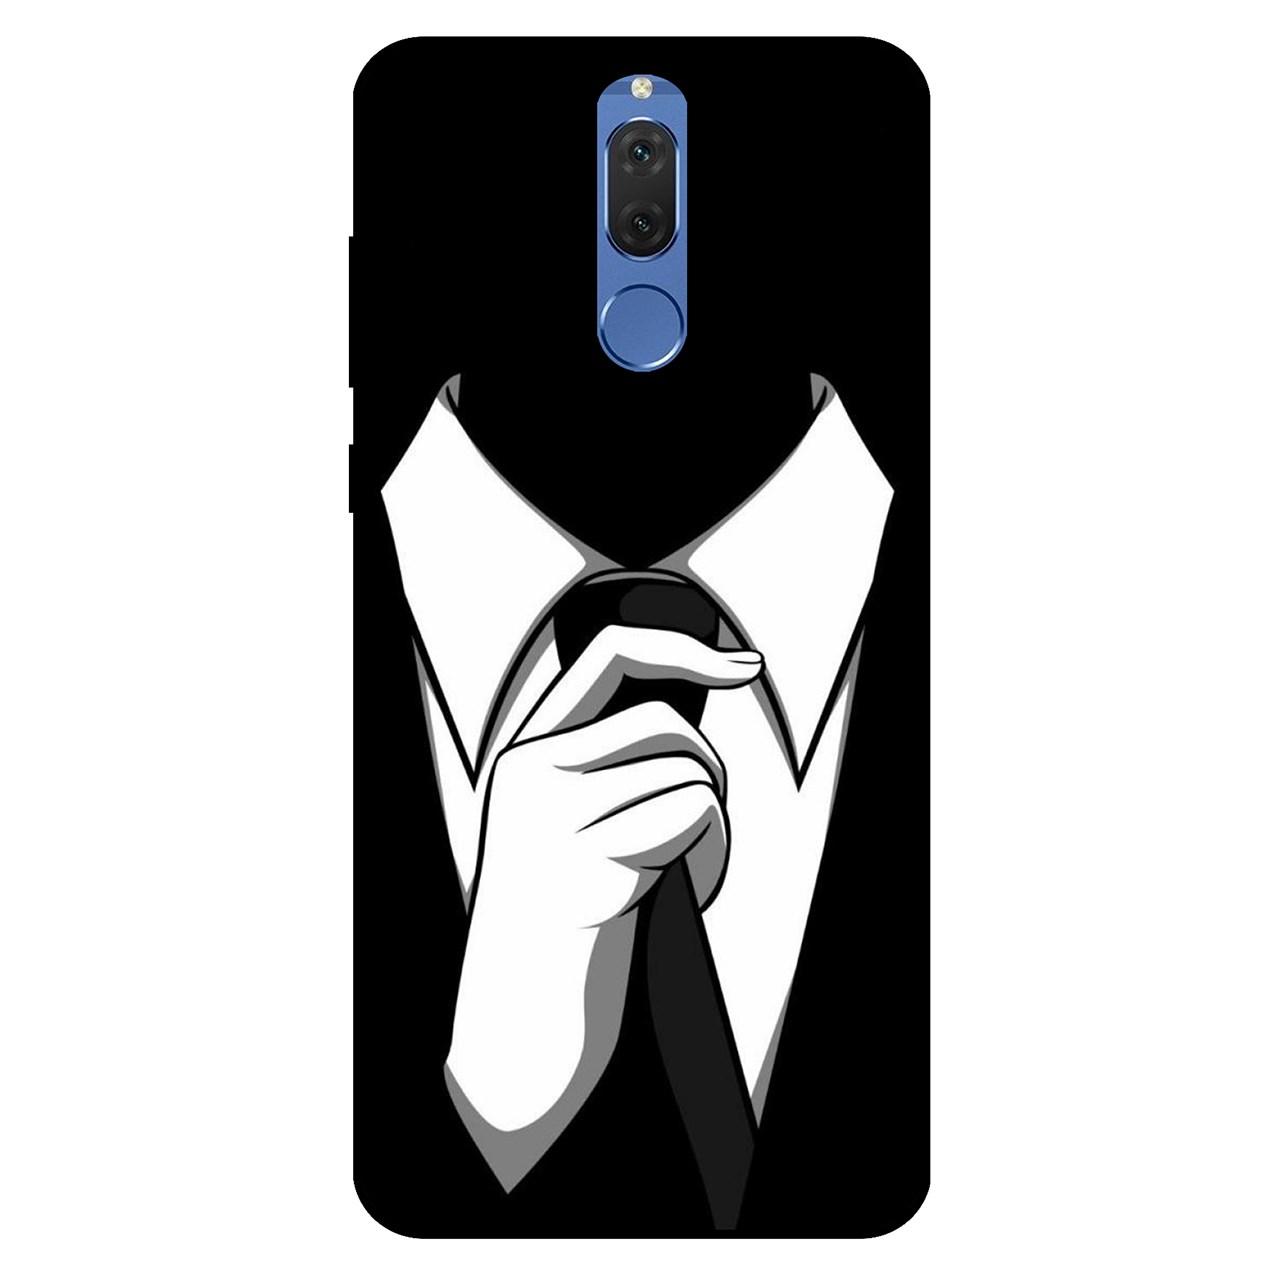 کاور کی اچ مدل 7131 مناسب برای گوشی موبایل هوآوی Mate 10 Lite